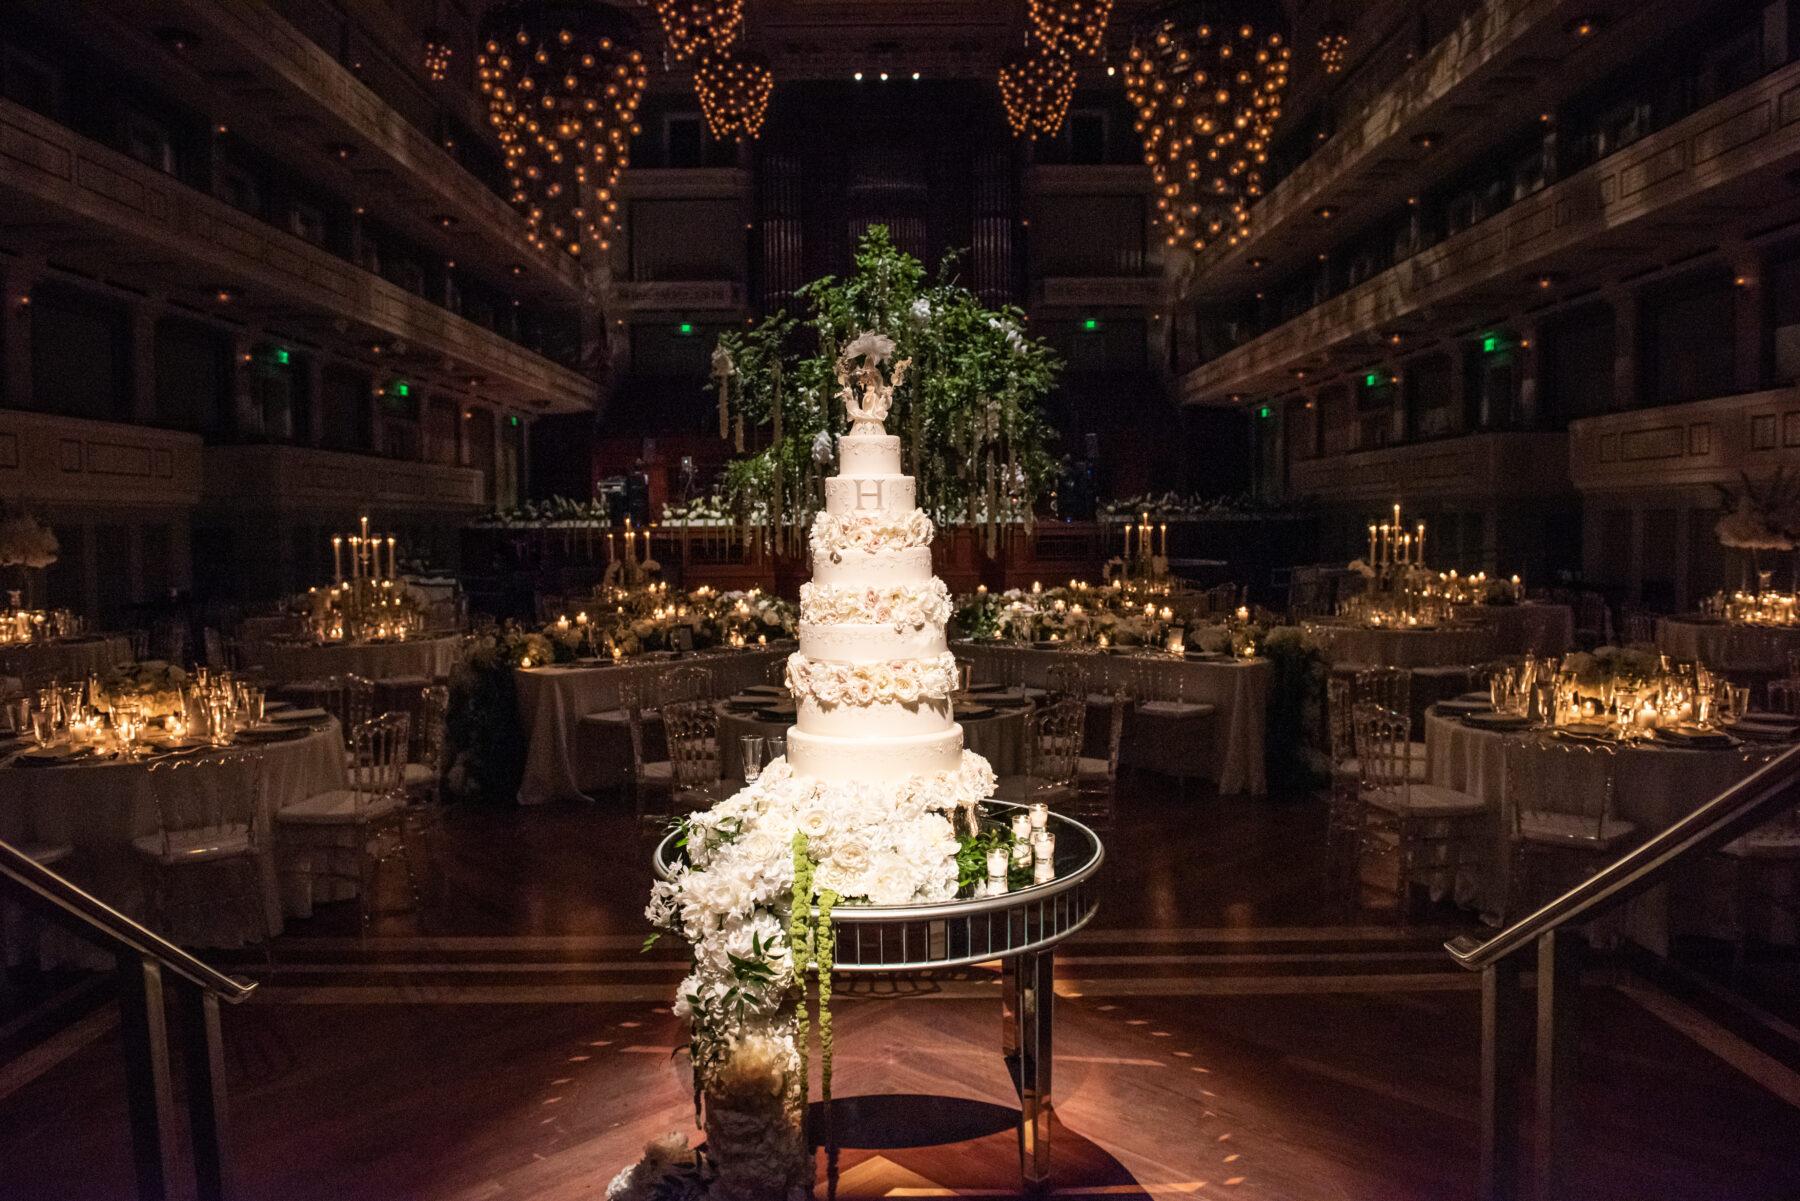 Schermerhorn Symphony Wedding: Floral Filled Luxurious Wedding by LMA Designs featured on Nashville Bride Guide